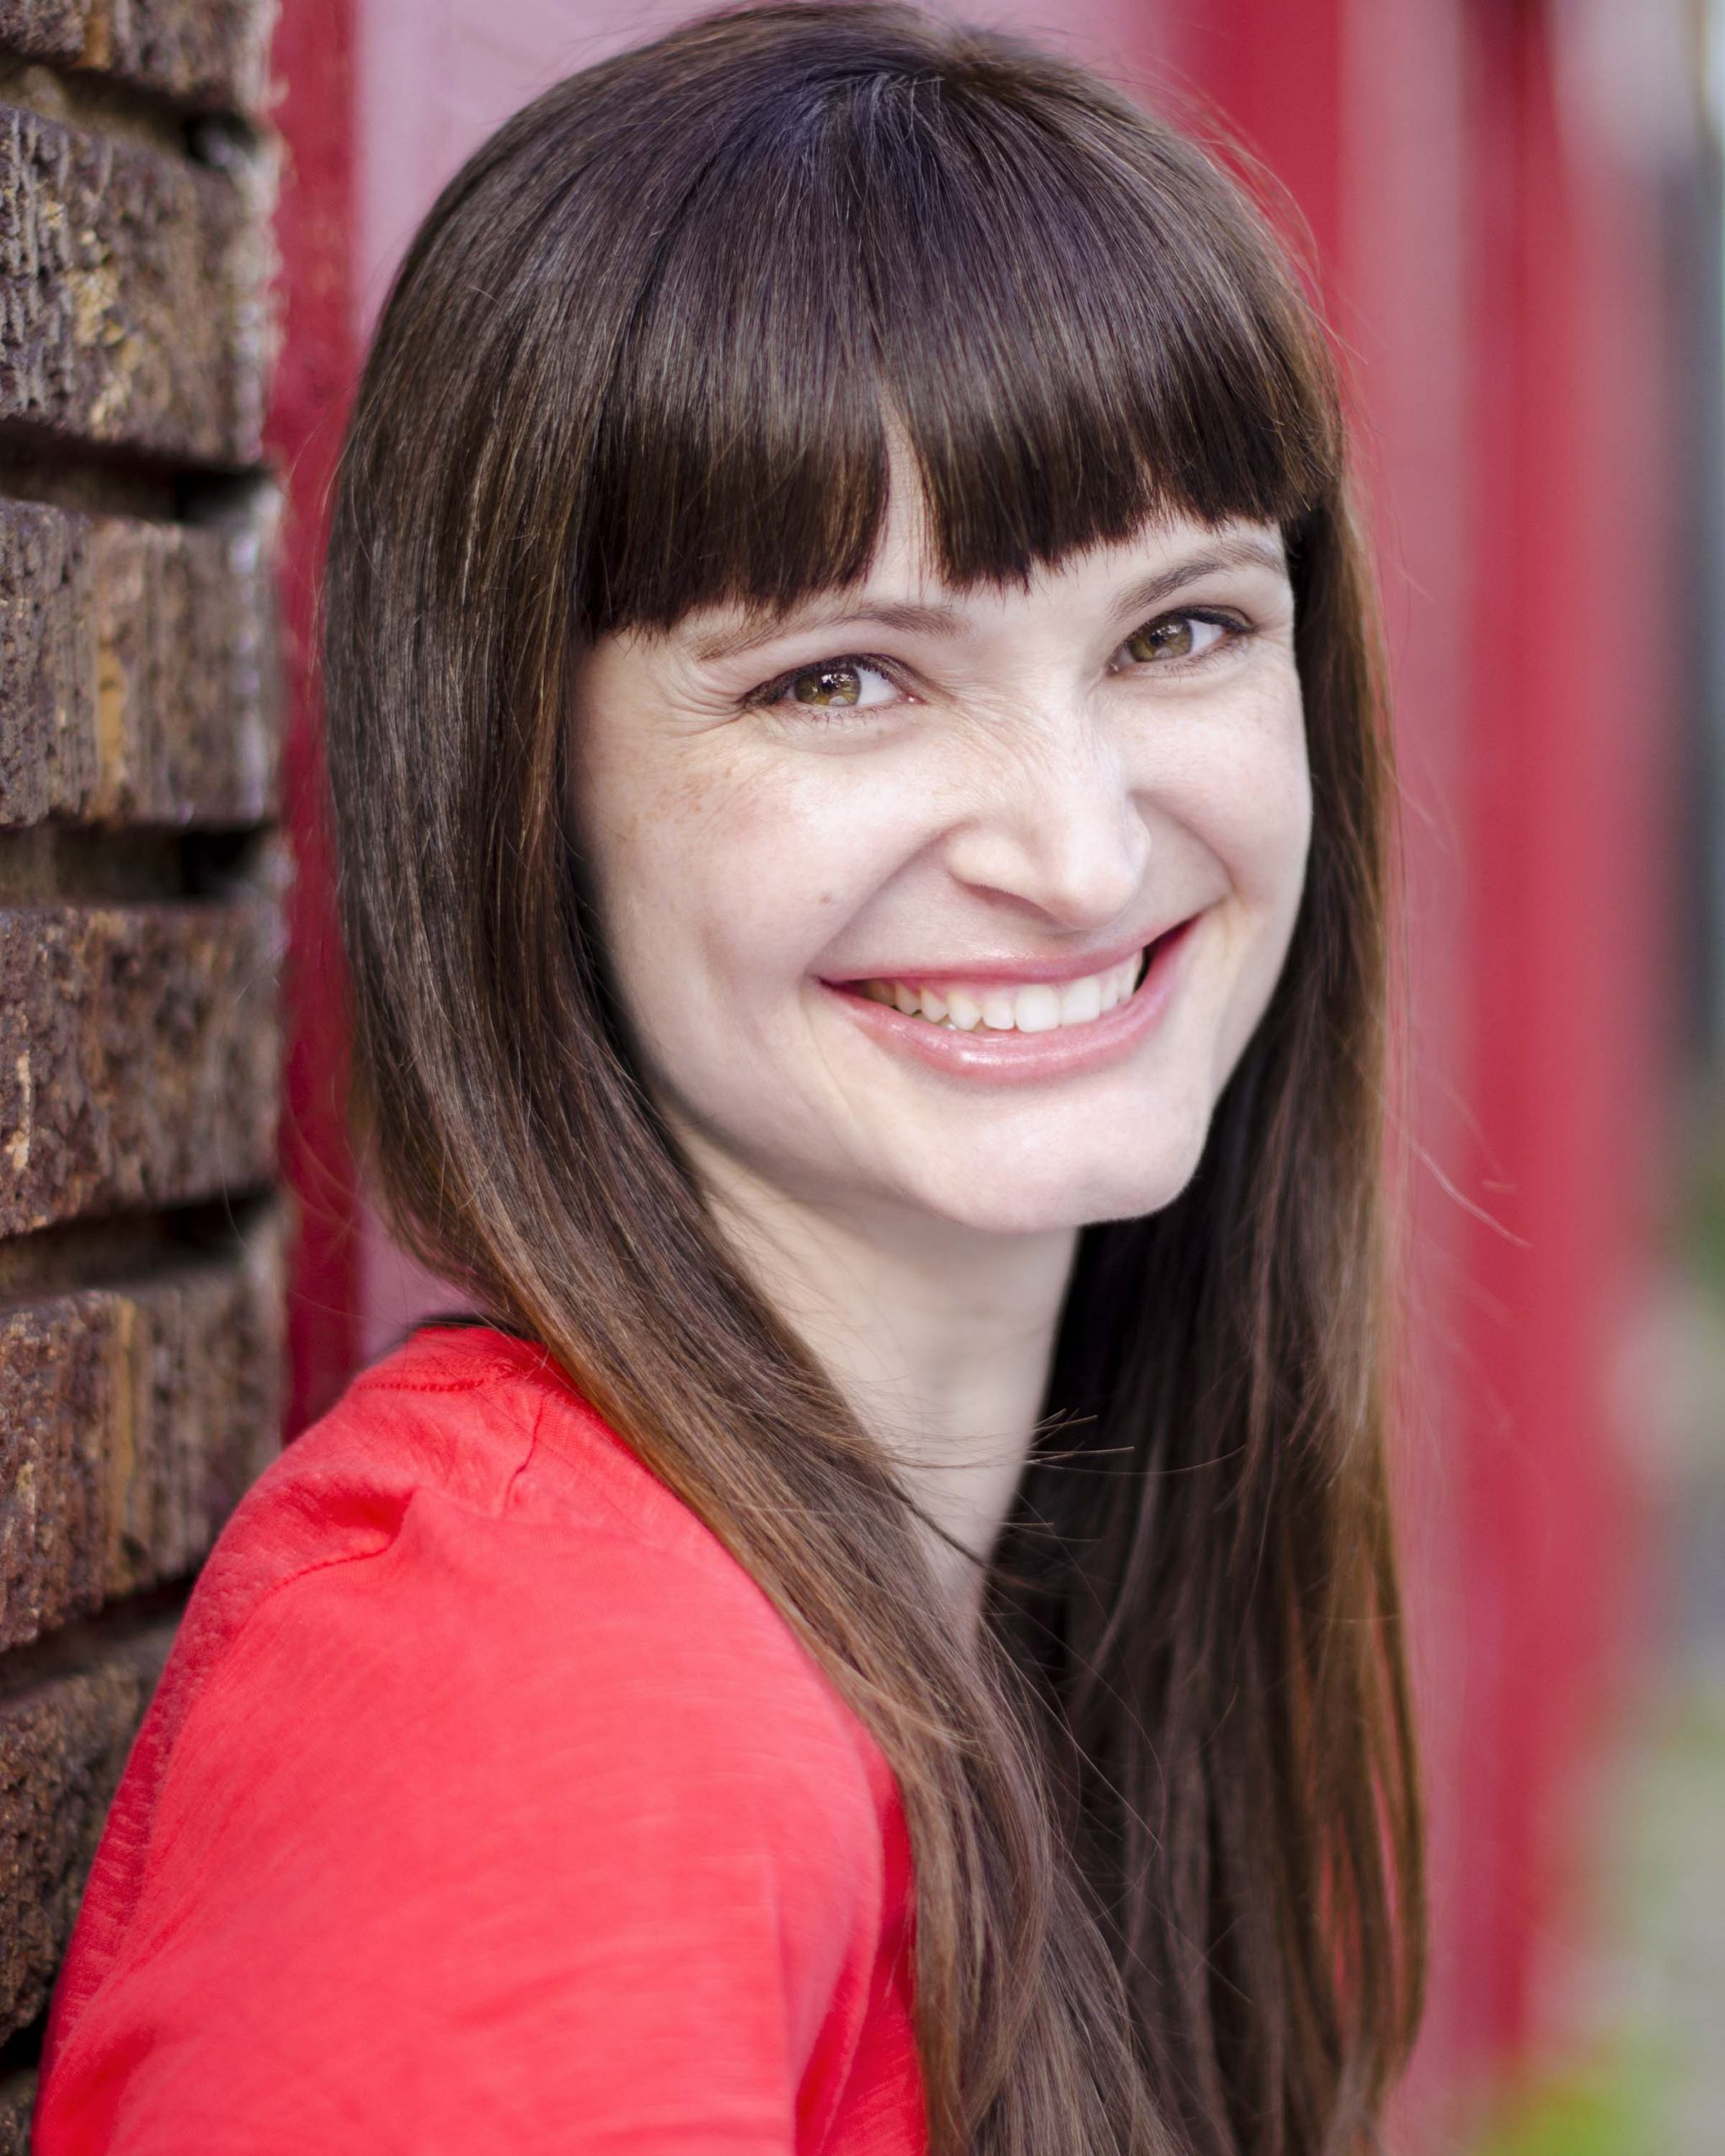 's Current Headshot 0110 (1) Brielle Silvestri